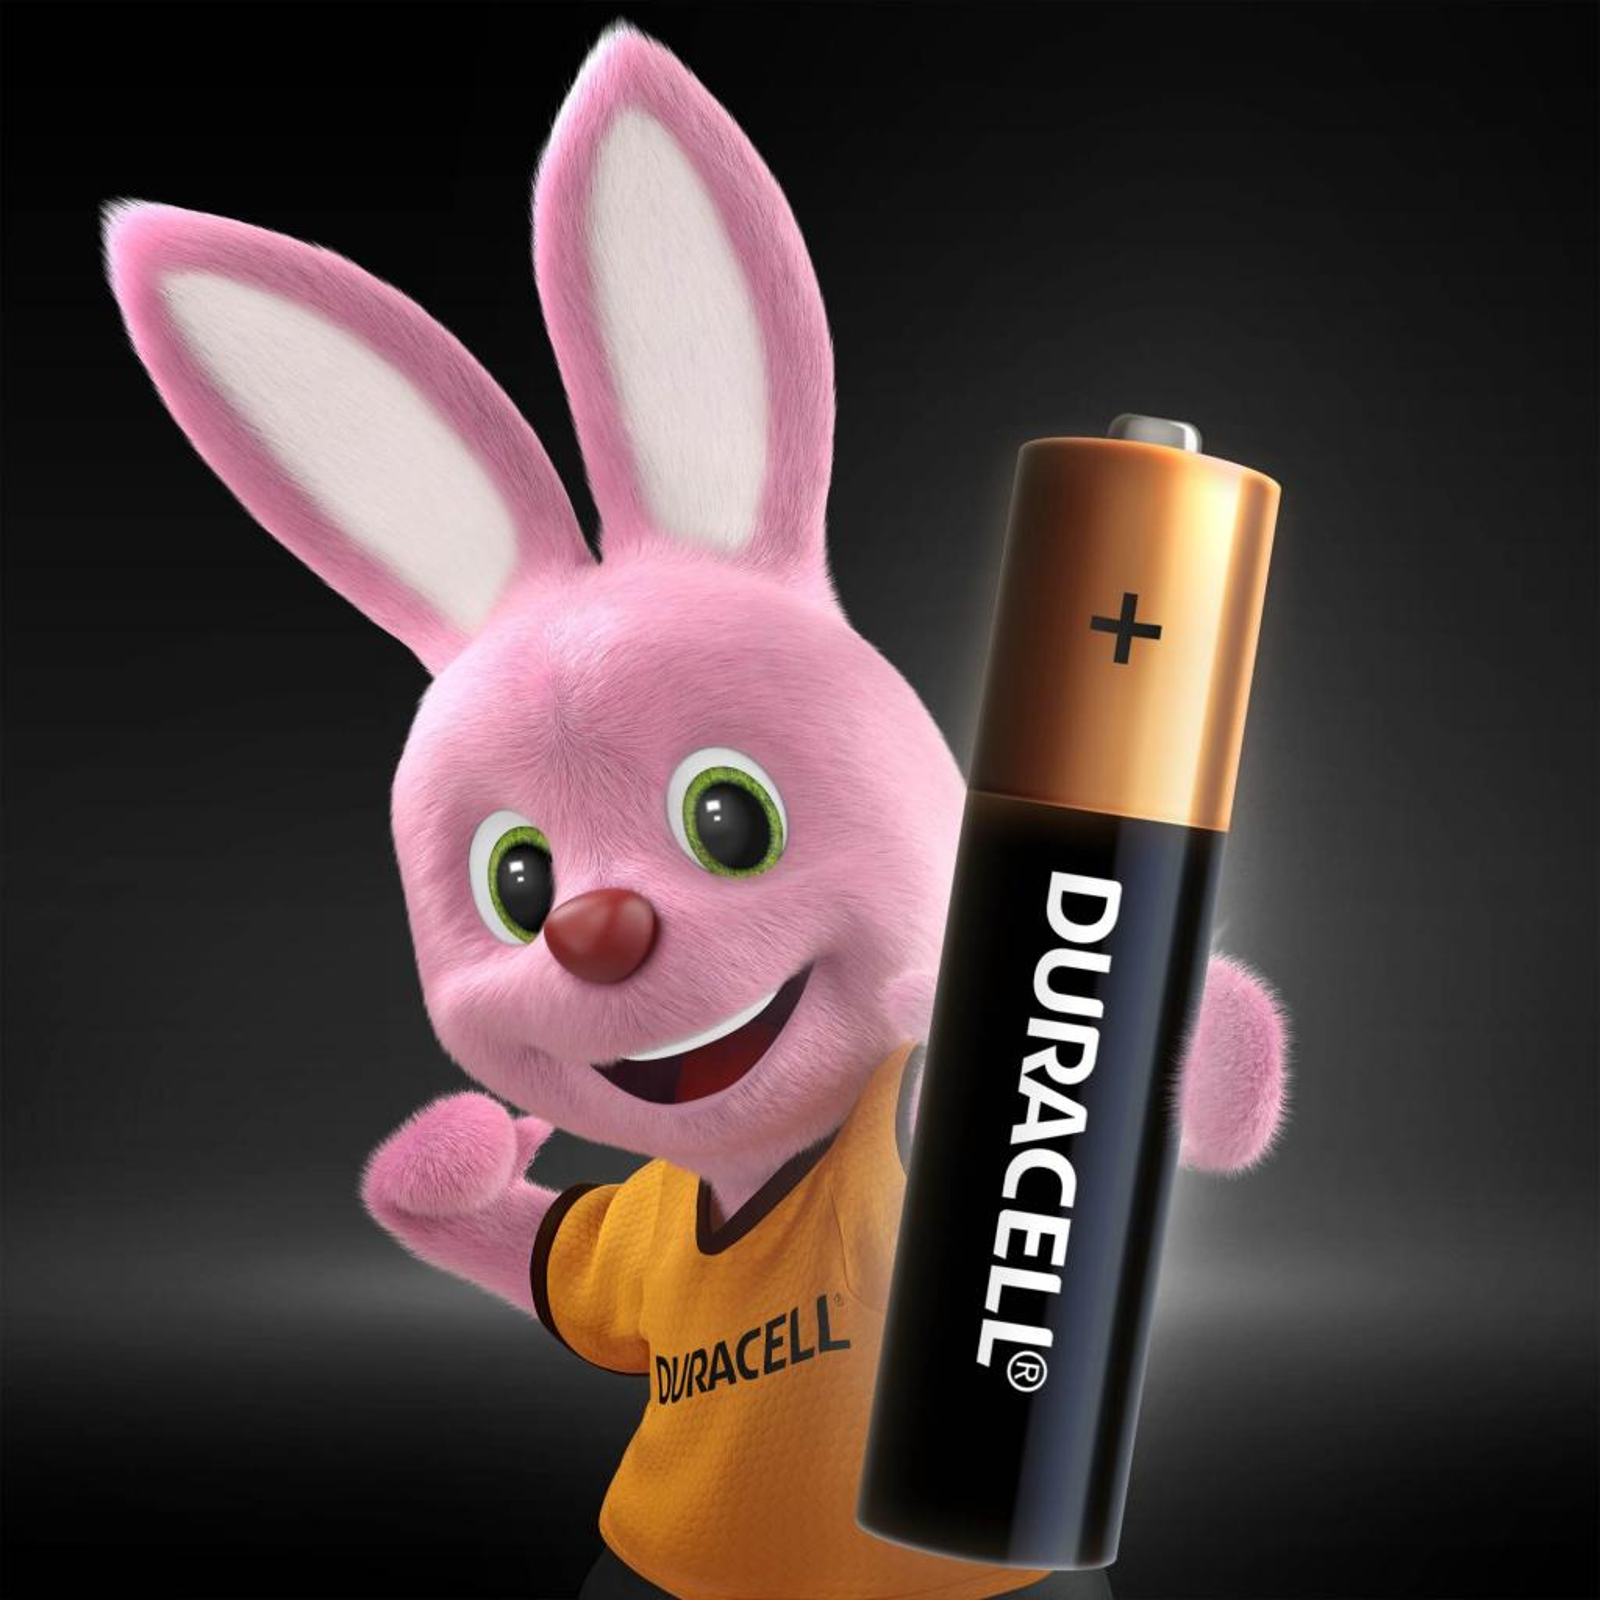 Батарейка AAA MN2400 LR03 * 4 Duracell (5000394052543 / 81545421) изображение 2